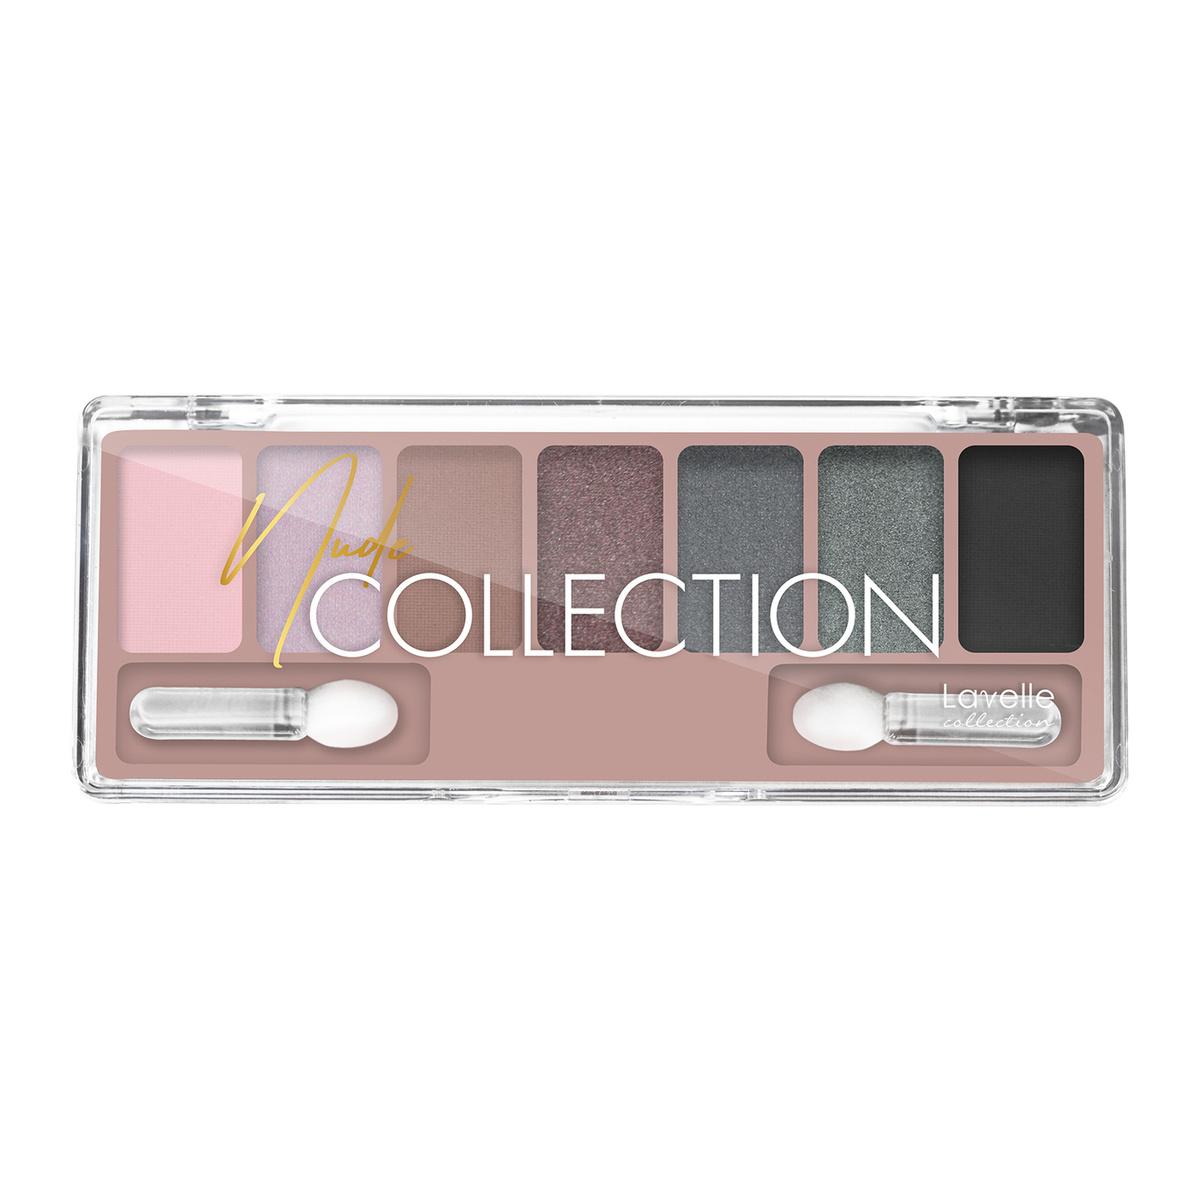 LavelleCollection Тени для век, NUDE COLLECTION, тон 04, серо-розовый нюд #1